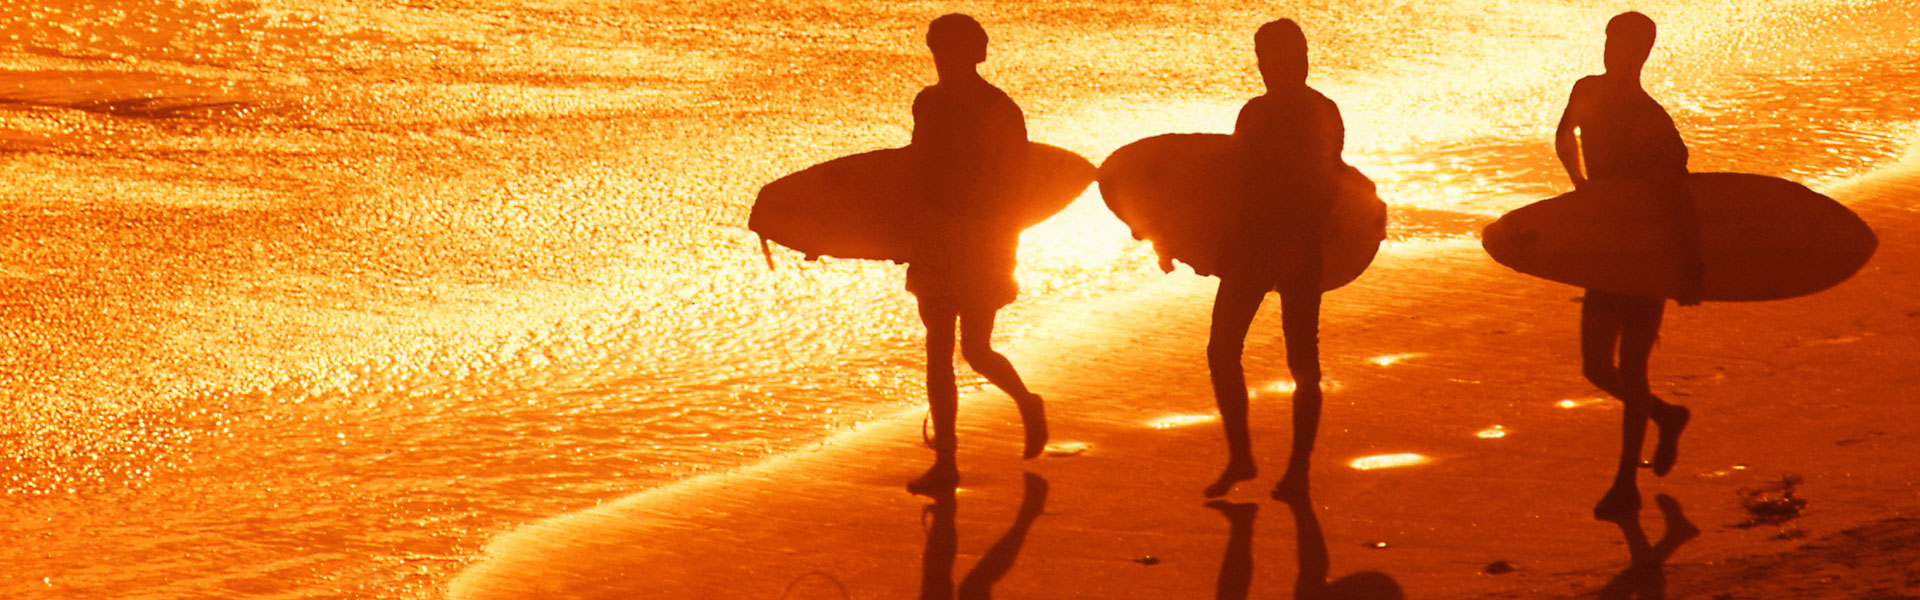 Surfers on the Beach at Sunset, Galveston, TX